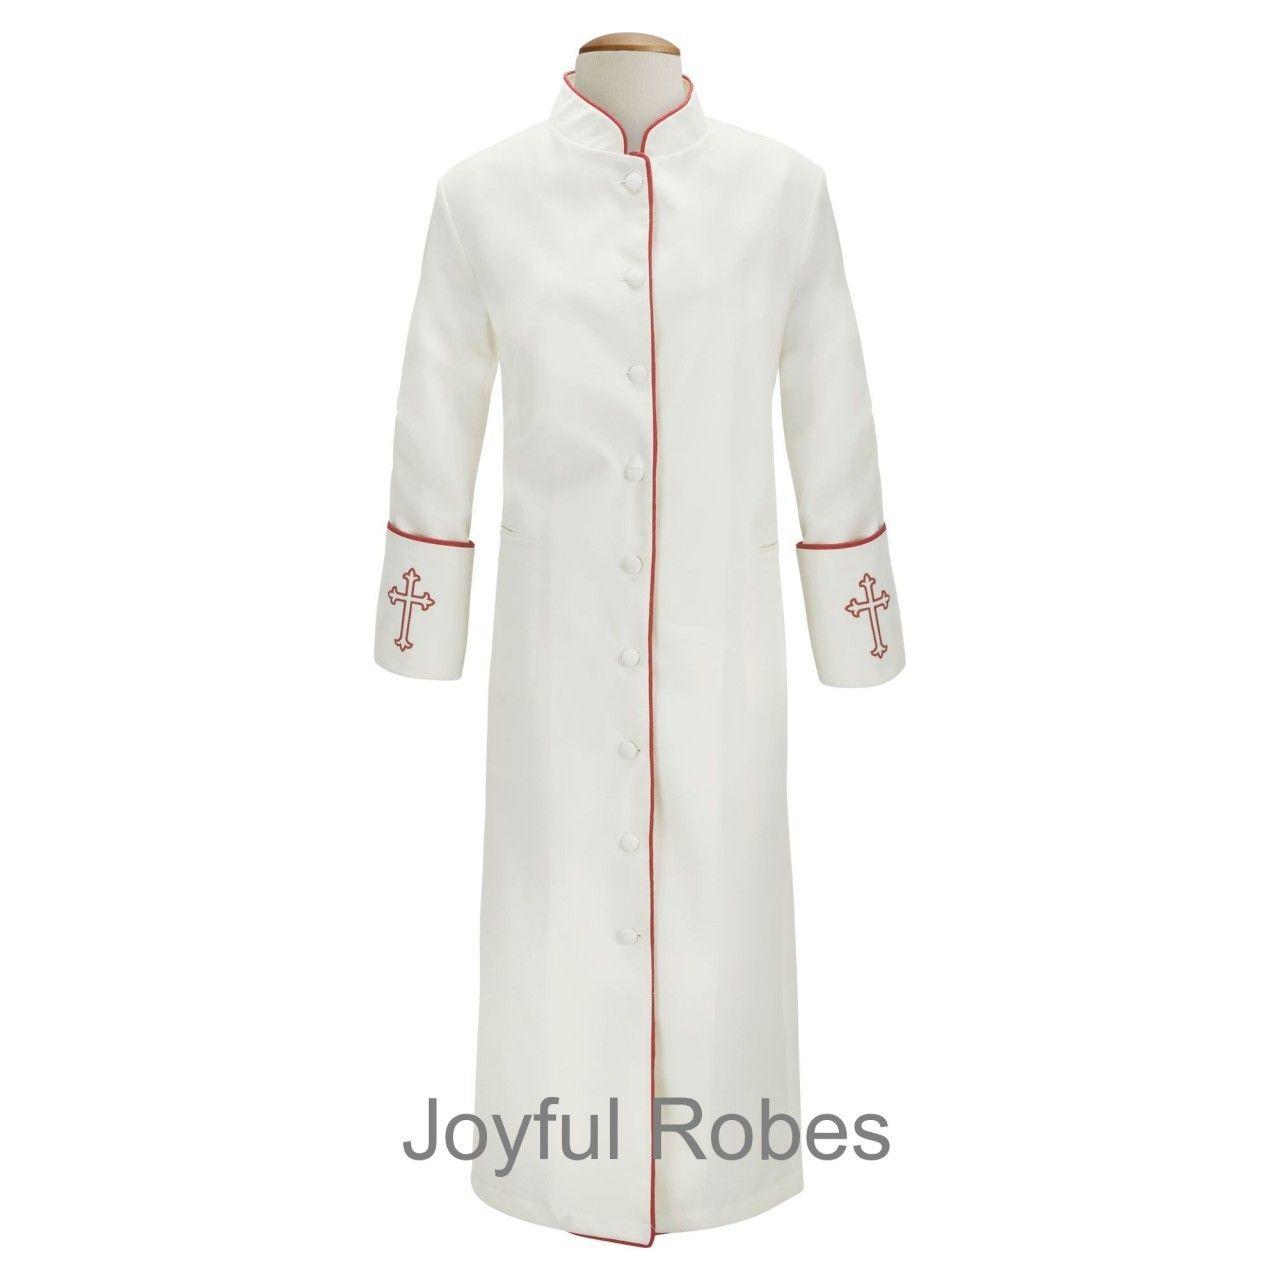 Ultra Premium Deluxe Fluted White Clergy Robe//Pastor Robe